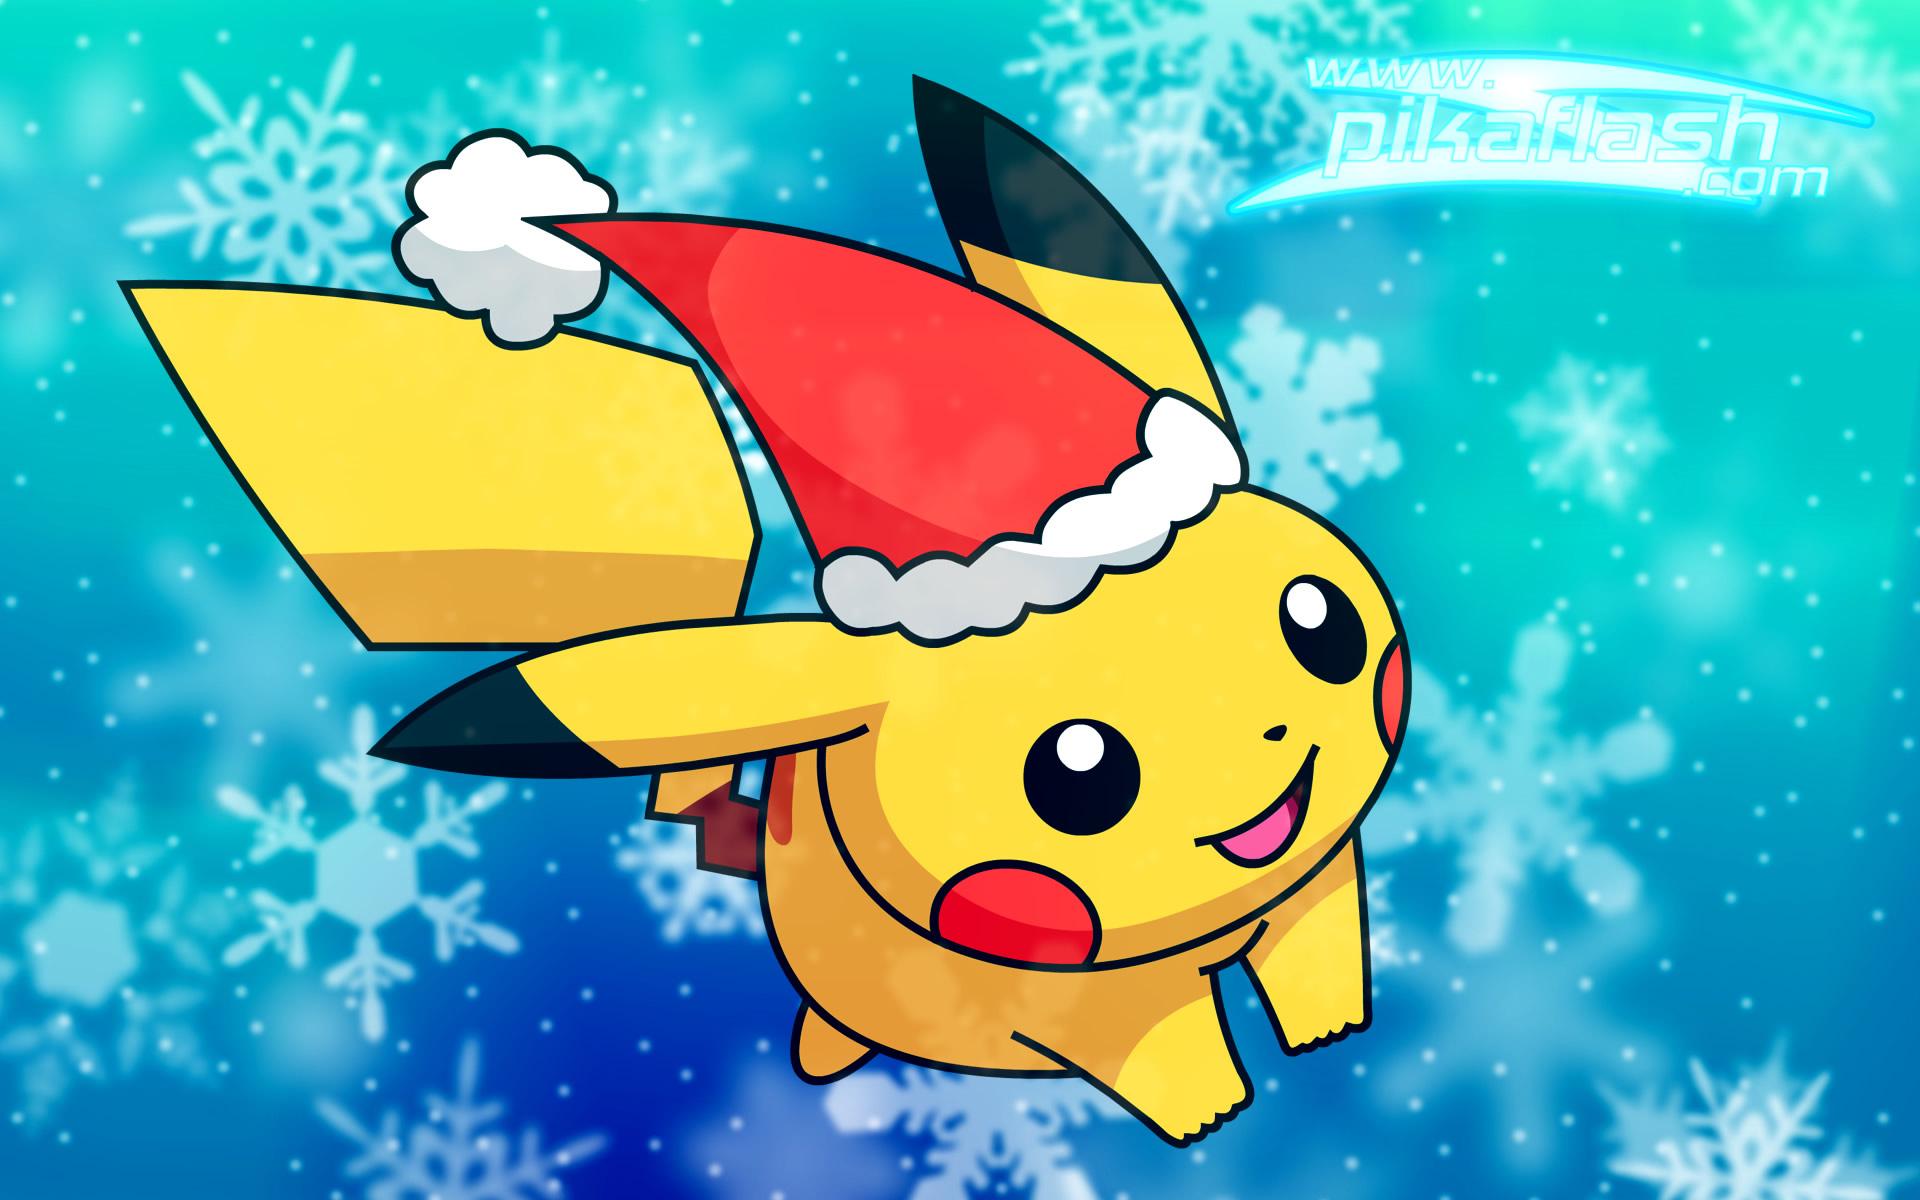 Pokemon Wallpaper HD ImageBankbiz 1920x1200